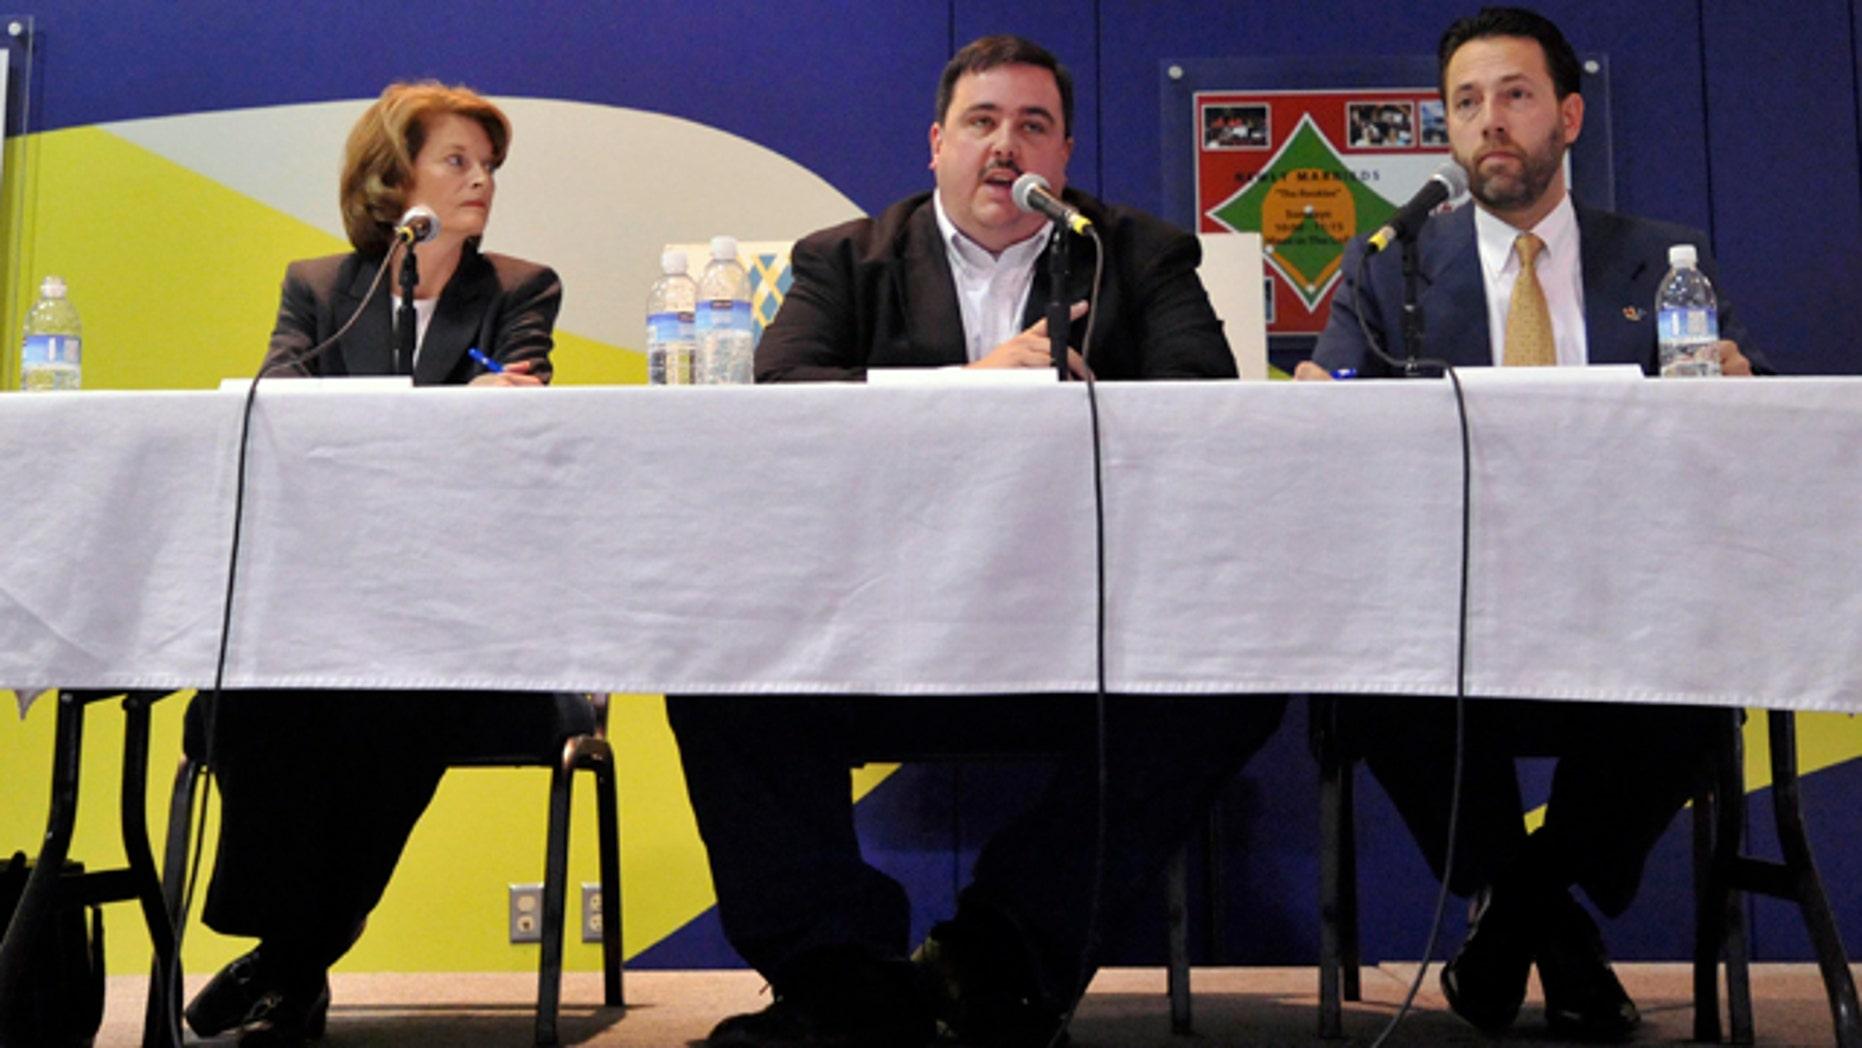 Oct. 7: U.S. Sen. Lisa Murkowski, R-Alaska, left, Democrat Scott McAdams, center, and Republican Joe Miller face off in a debate in Anchorage, Alaska.